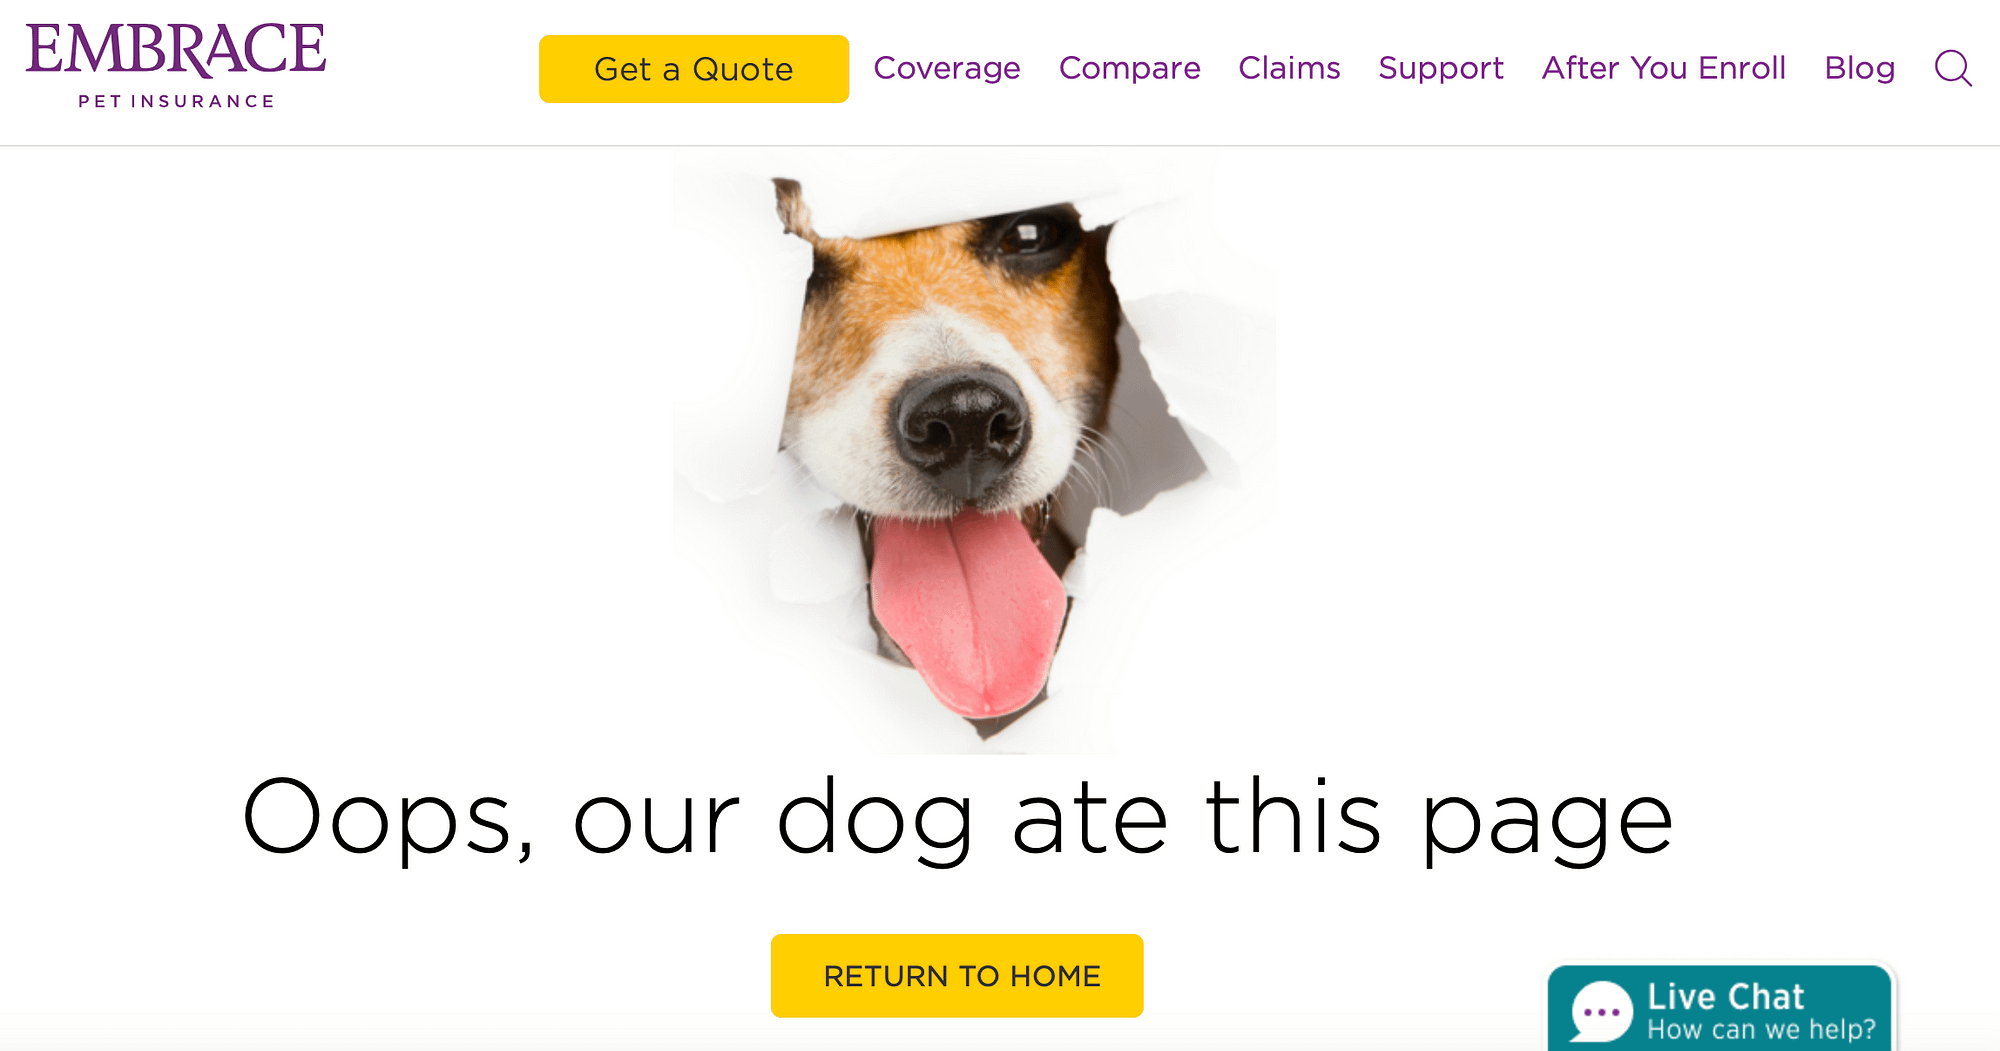 The Embrace Pet Insurance 404 error page.